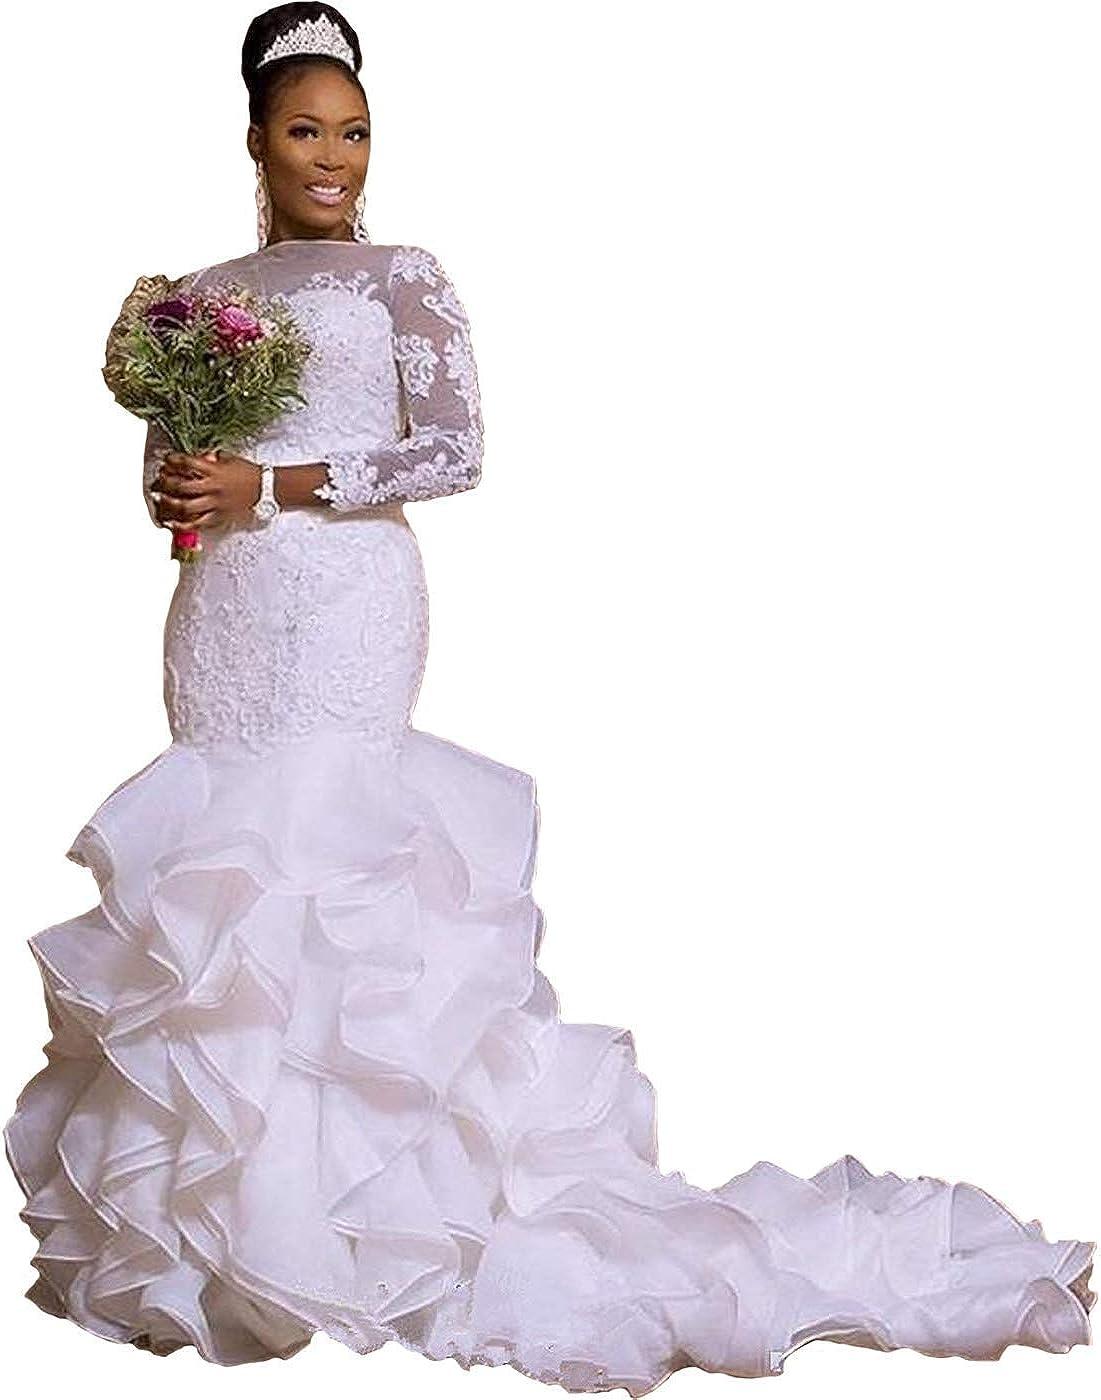 iluckin Mermaid Organza Wedding Dresses with Ruffles Train Long Sleeve for Women Bride Bridal Ball Gowns Plus Size